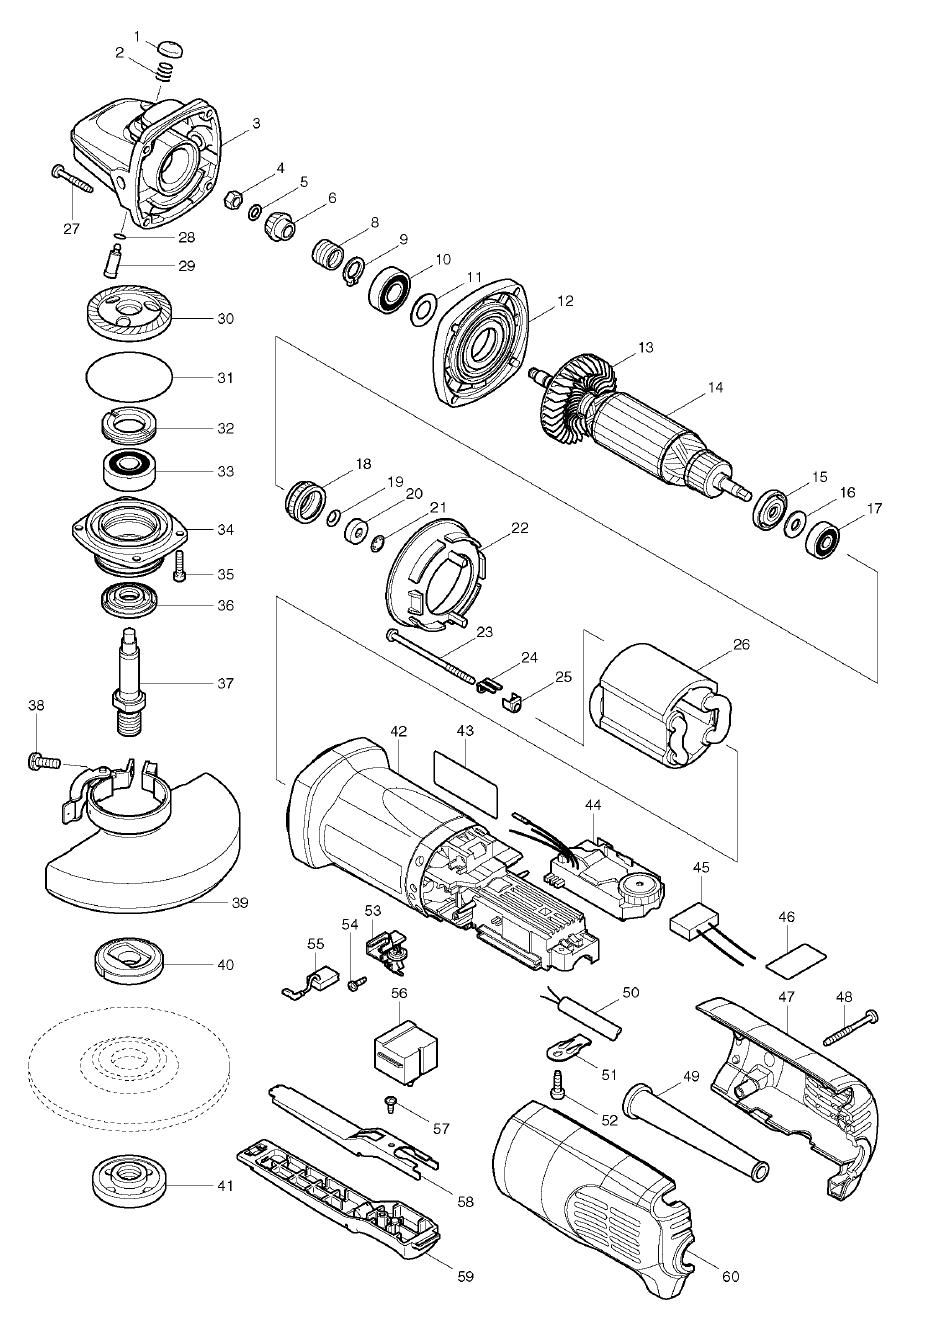 Makita 9565PCV Parts List | Makita 9565PCV Repair Parts | OEM Parts on